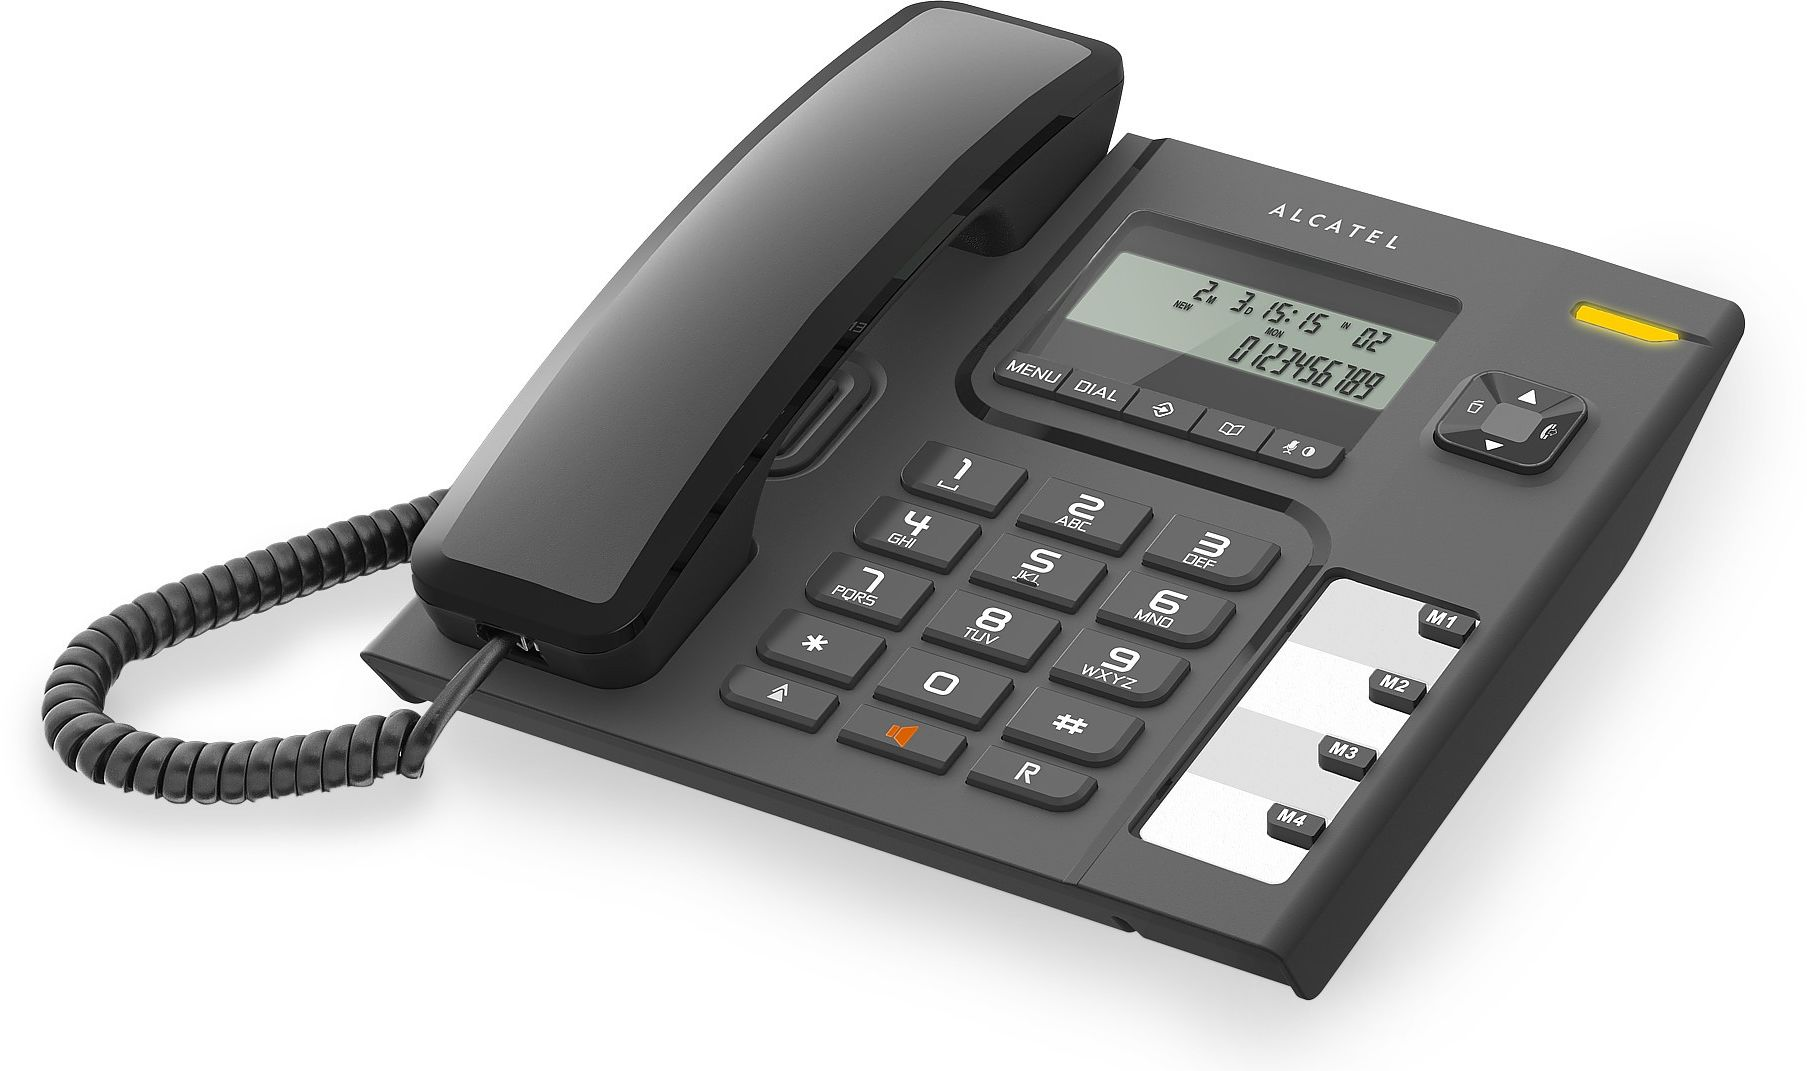 Telefon Temporis 56 ALCATEL